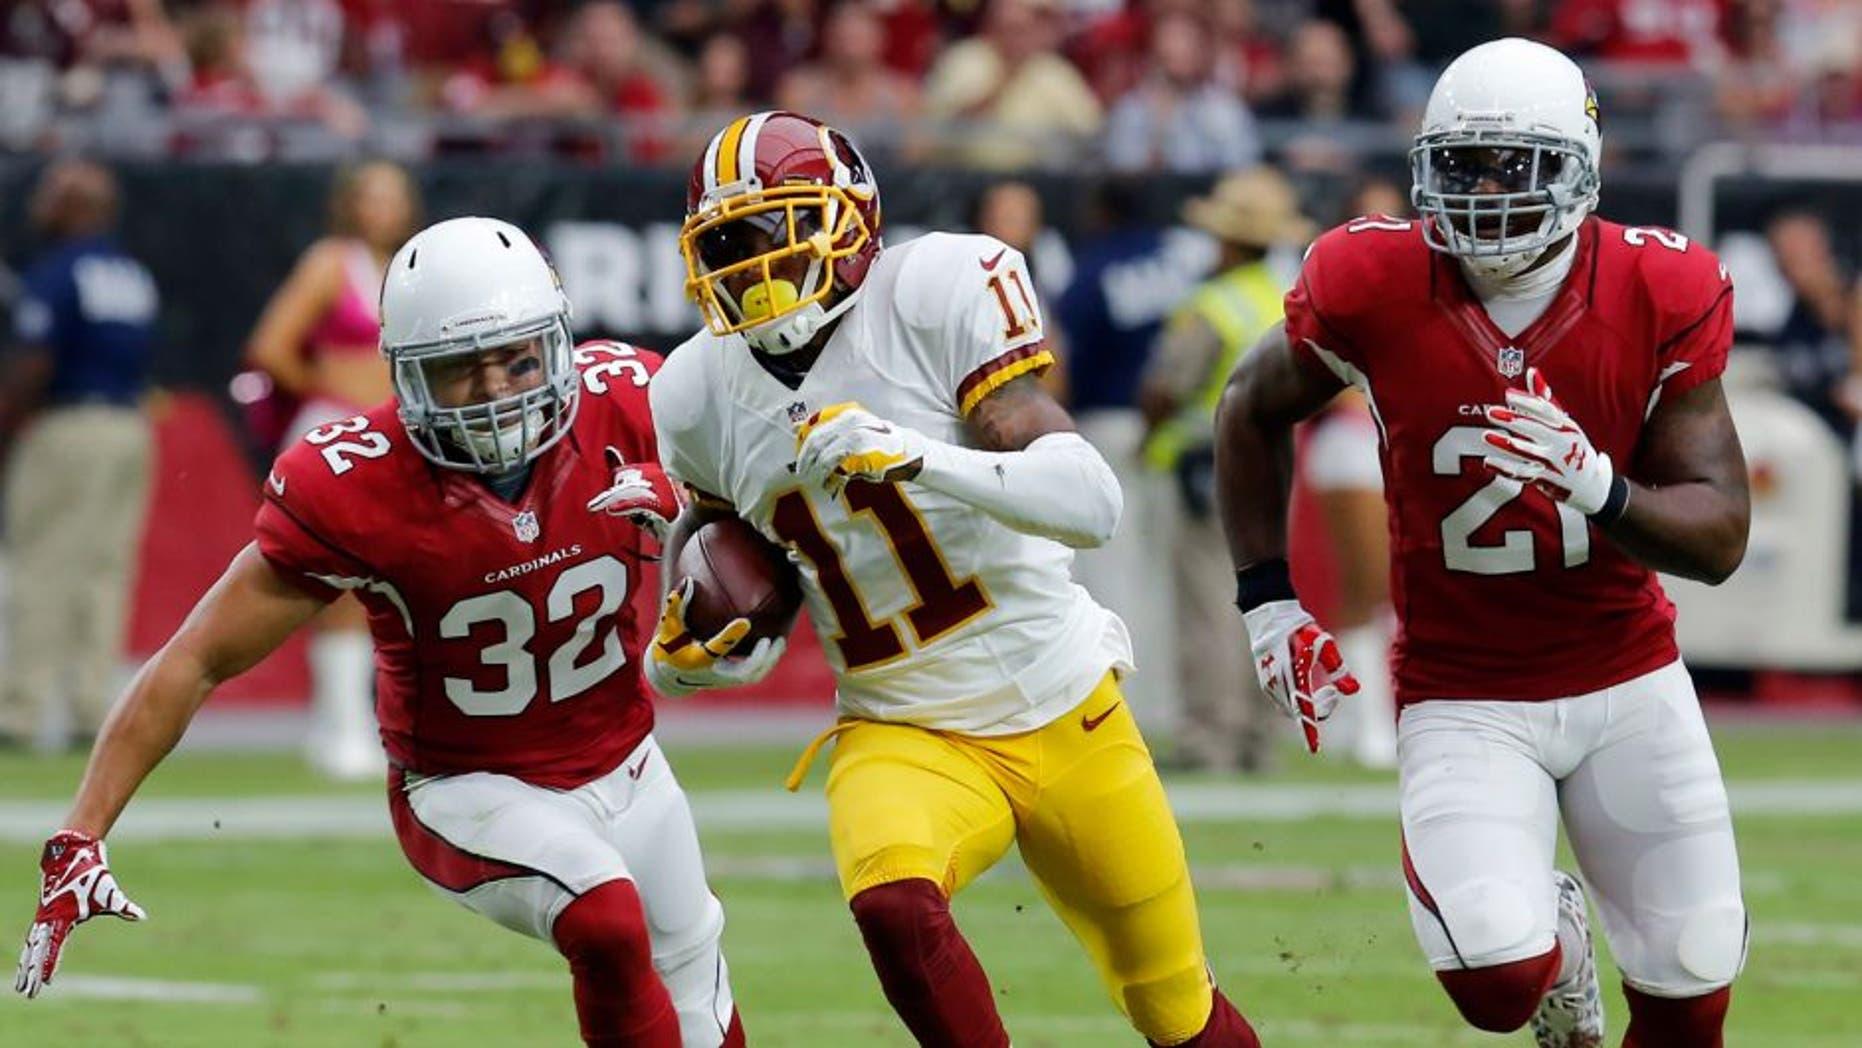 Washington Redskins wide receiver DeSean Jackson (11) runs for a touchdown as Arizona Cardinals free safety Tyrann Mathieu (32) and Patrick Peterson (21) pursue during the first half of an NFL football game, Sunday, Oct. 12, 2014, in Glendale, Ariz.(AP Photo/Rick Scuteri)